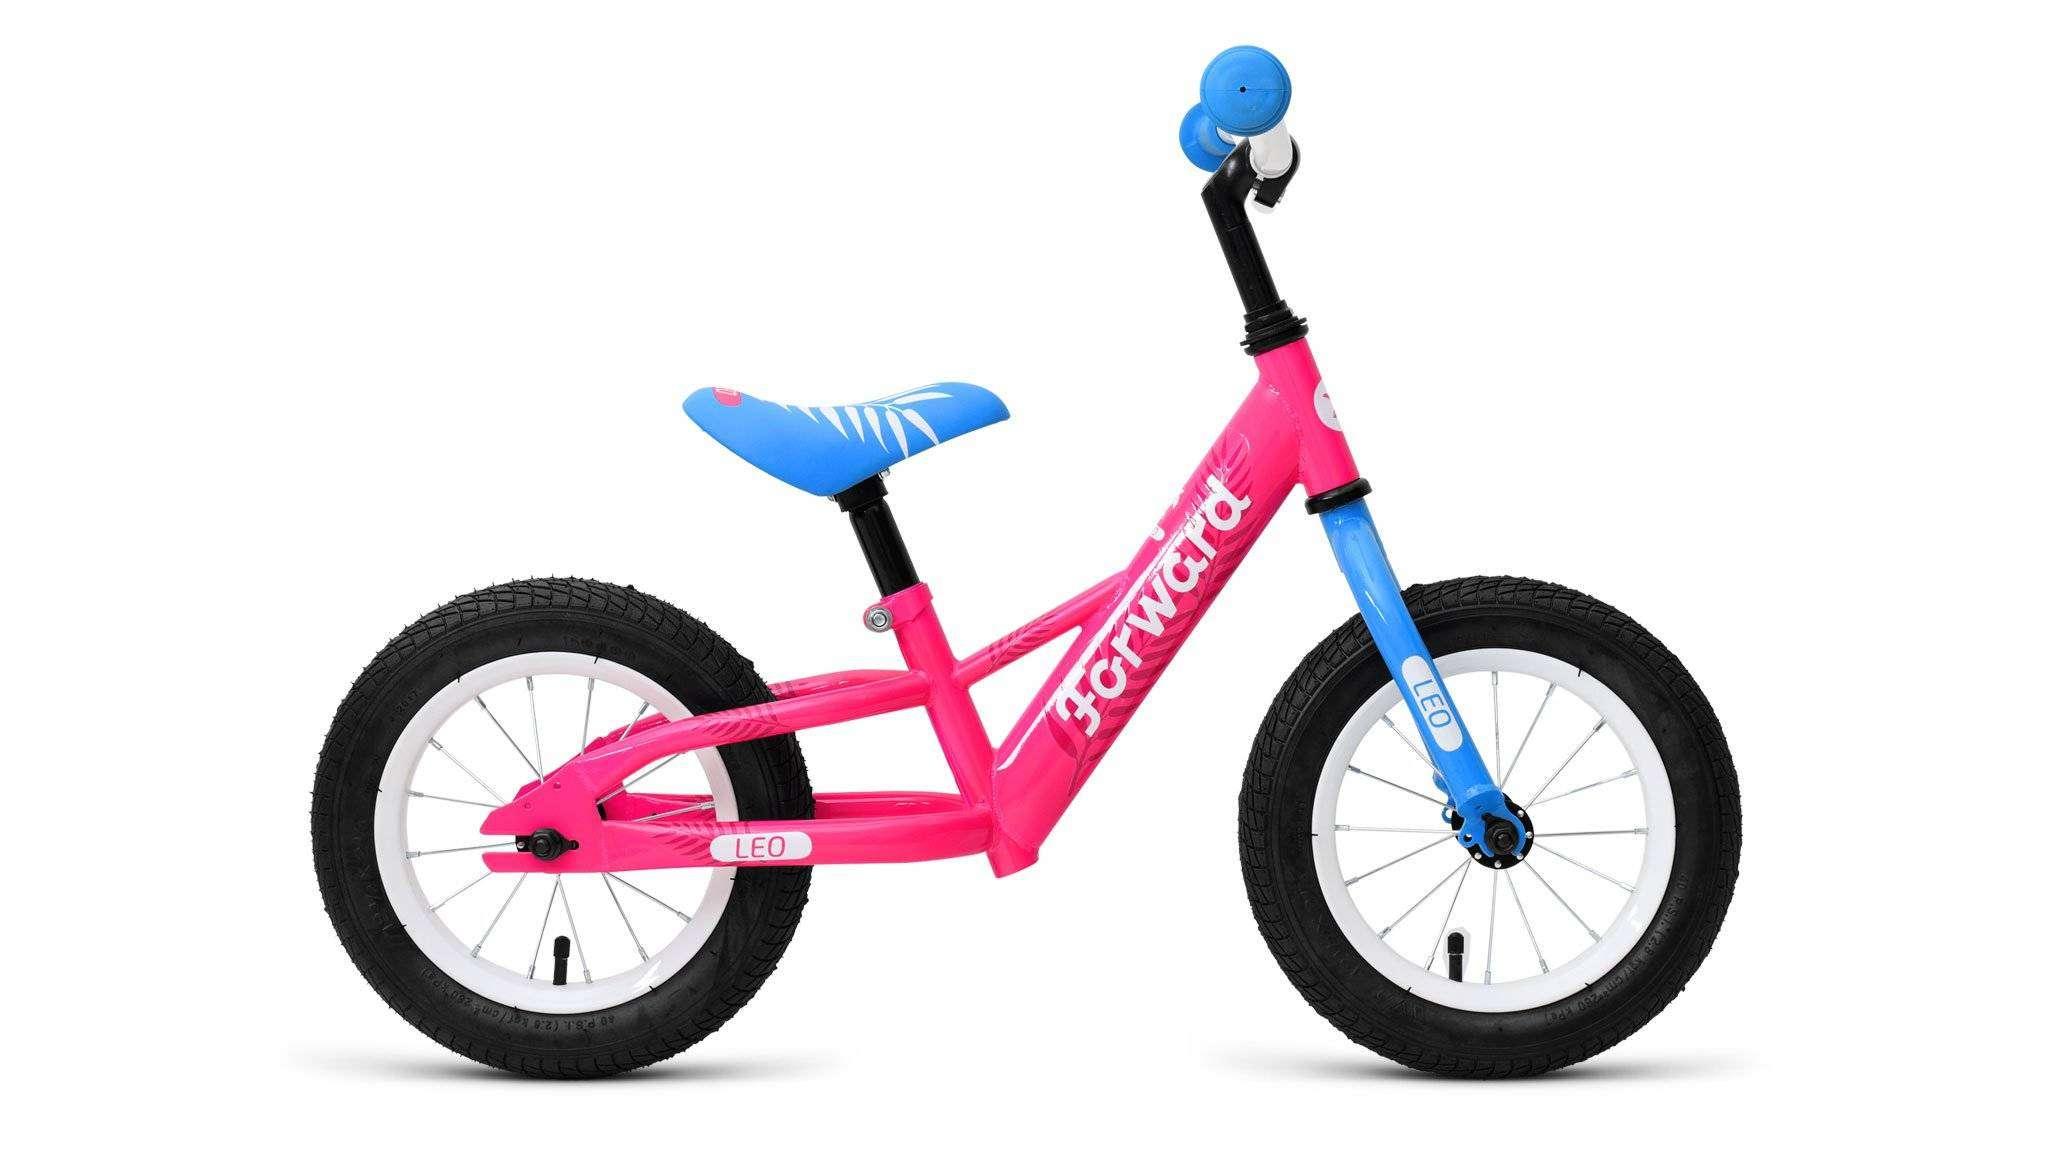 Велосипед FORWARD LEO 2017-2018 36882